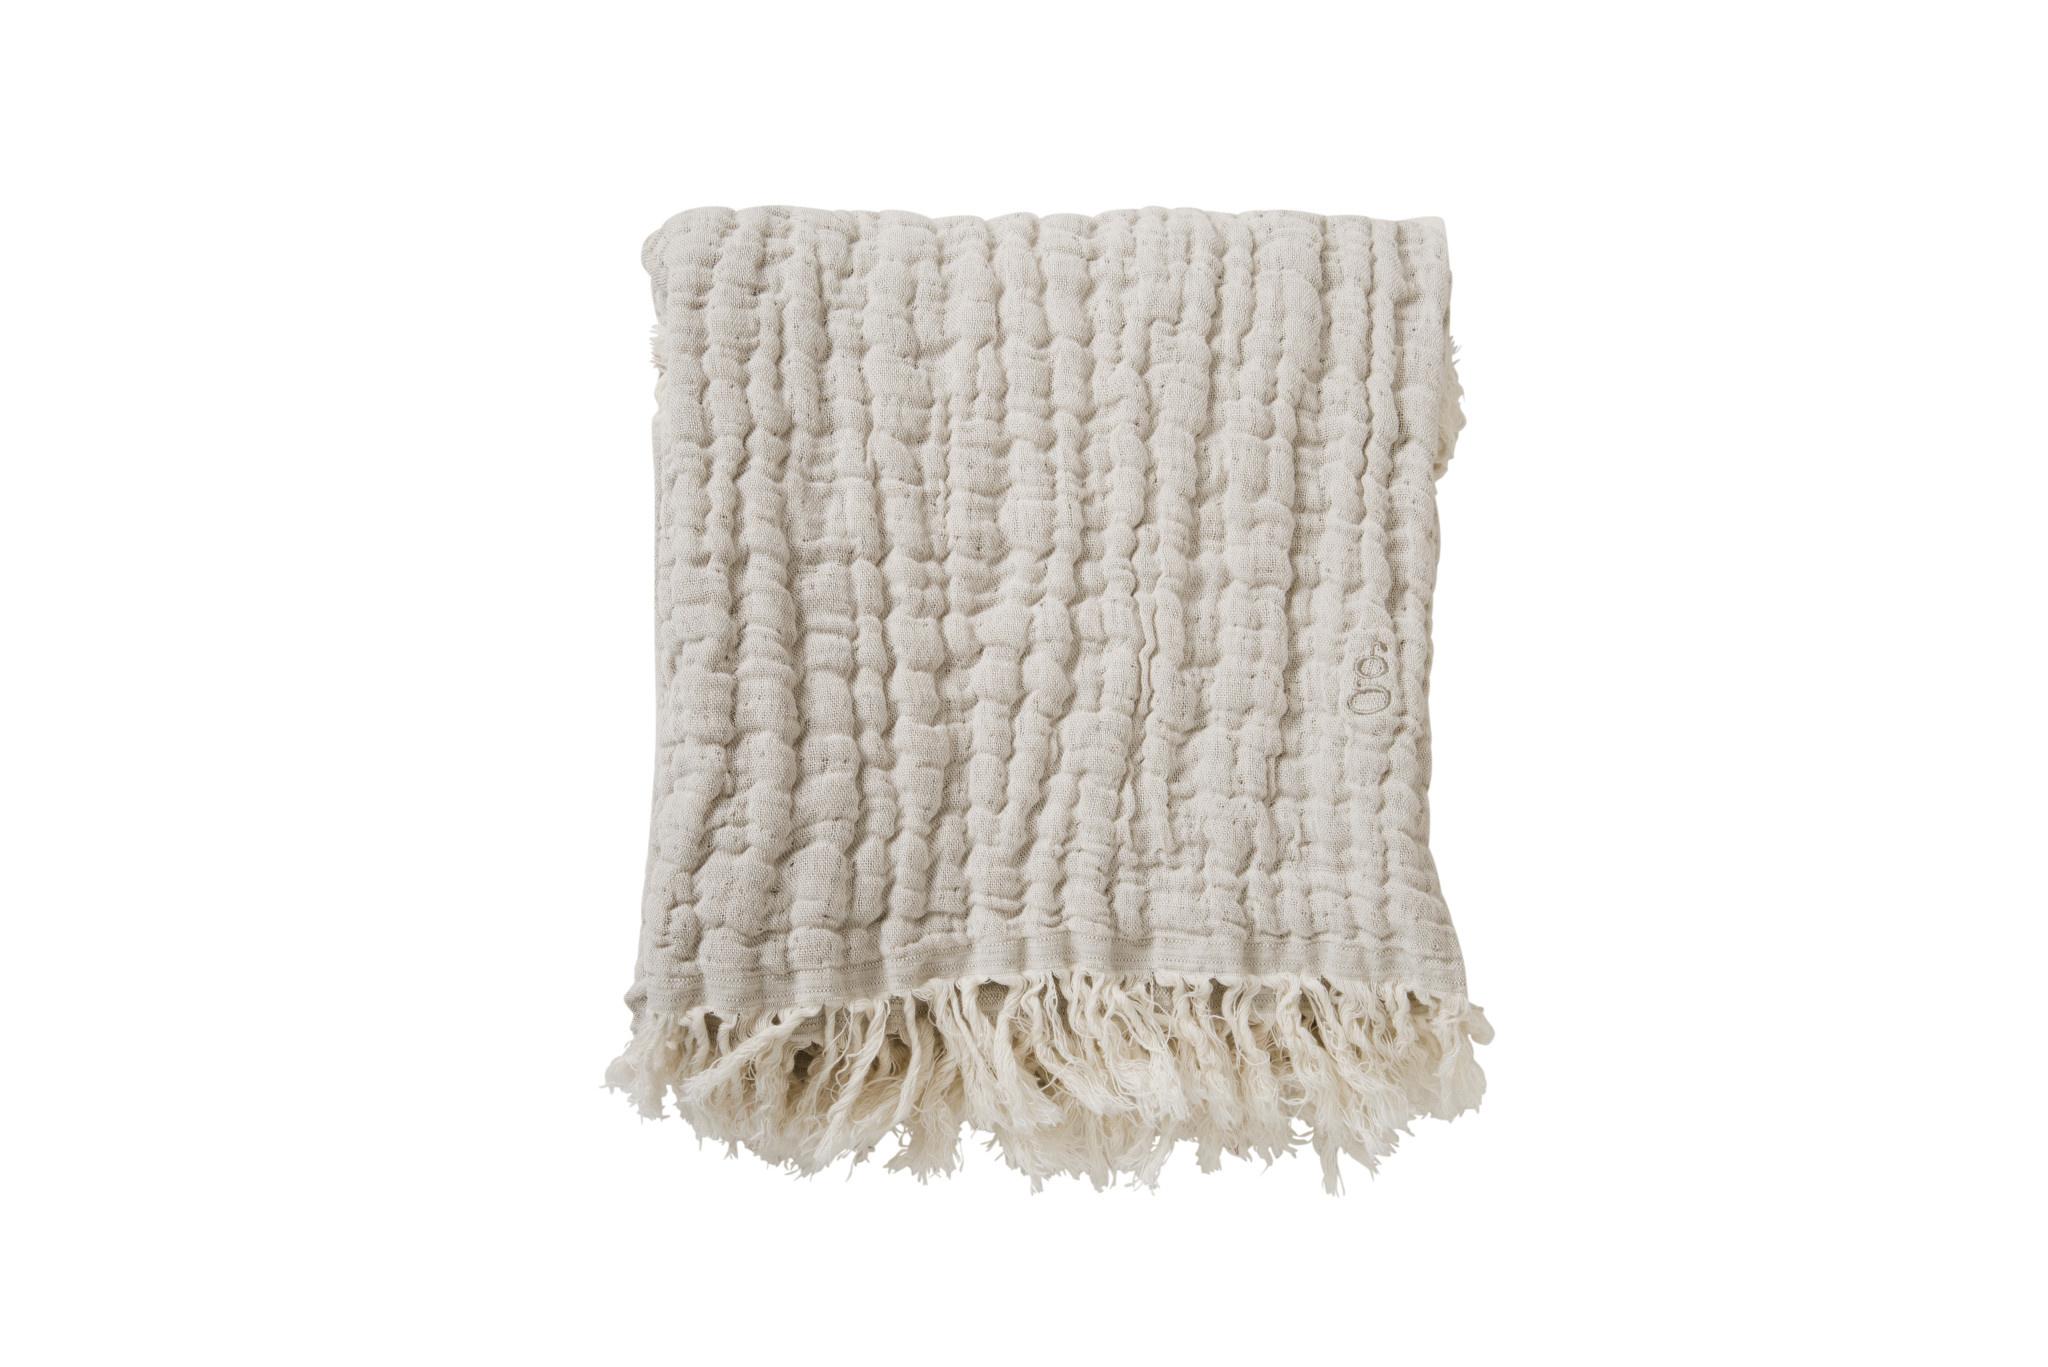 Mellow lin blanket s-2